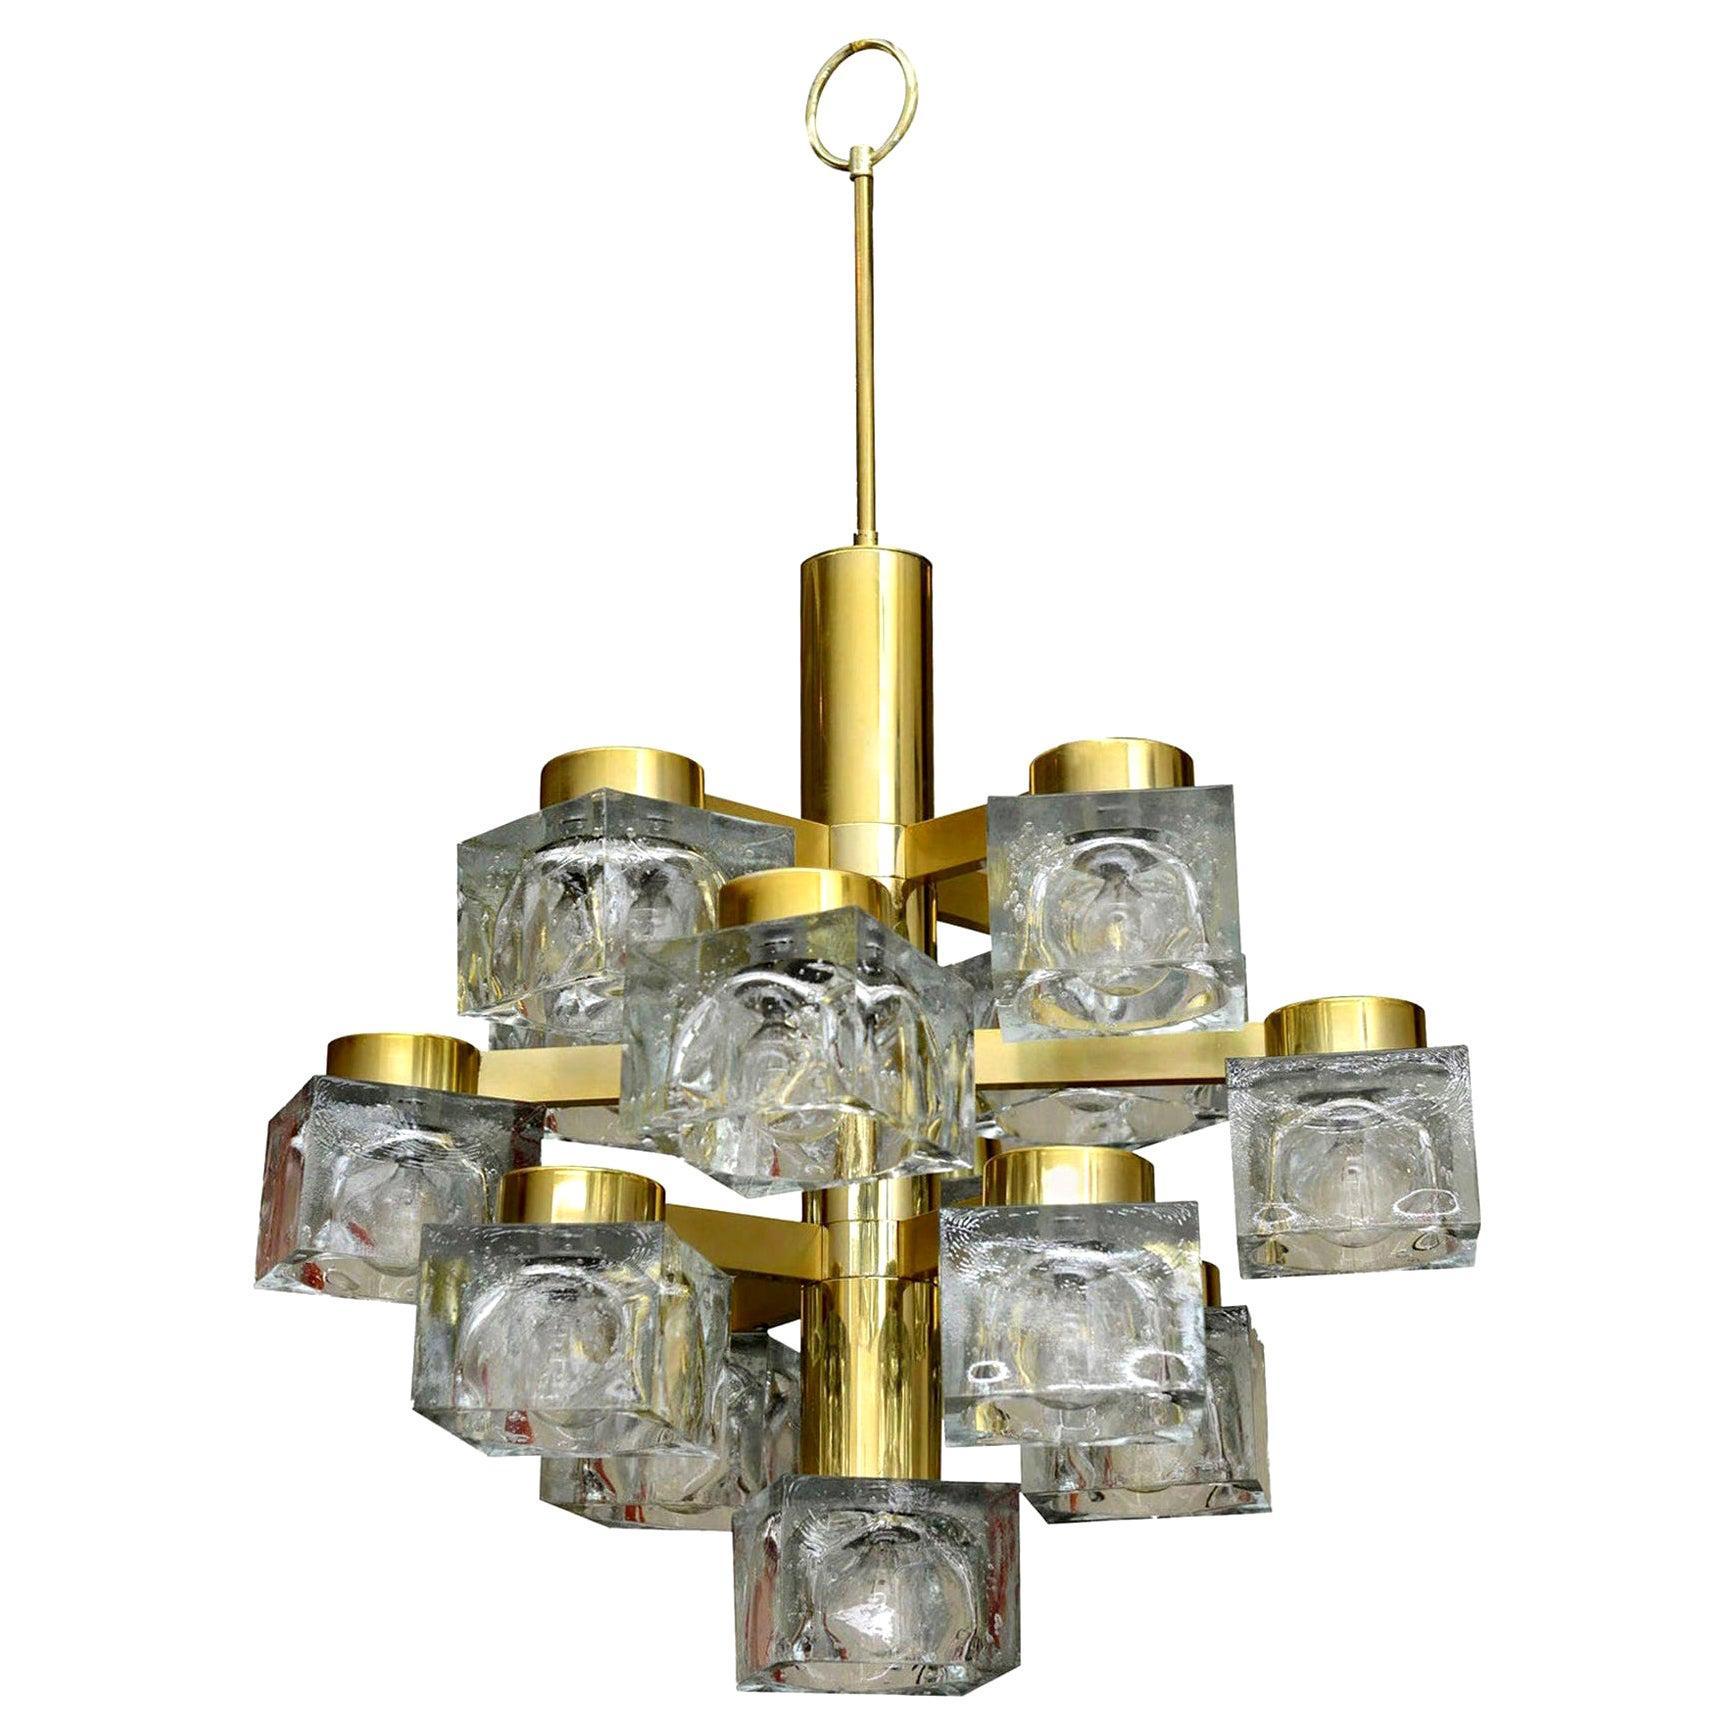 Gaetano Sciolari Brass and Cube Glass Chandelier Vintage, Italian